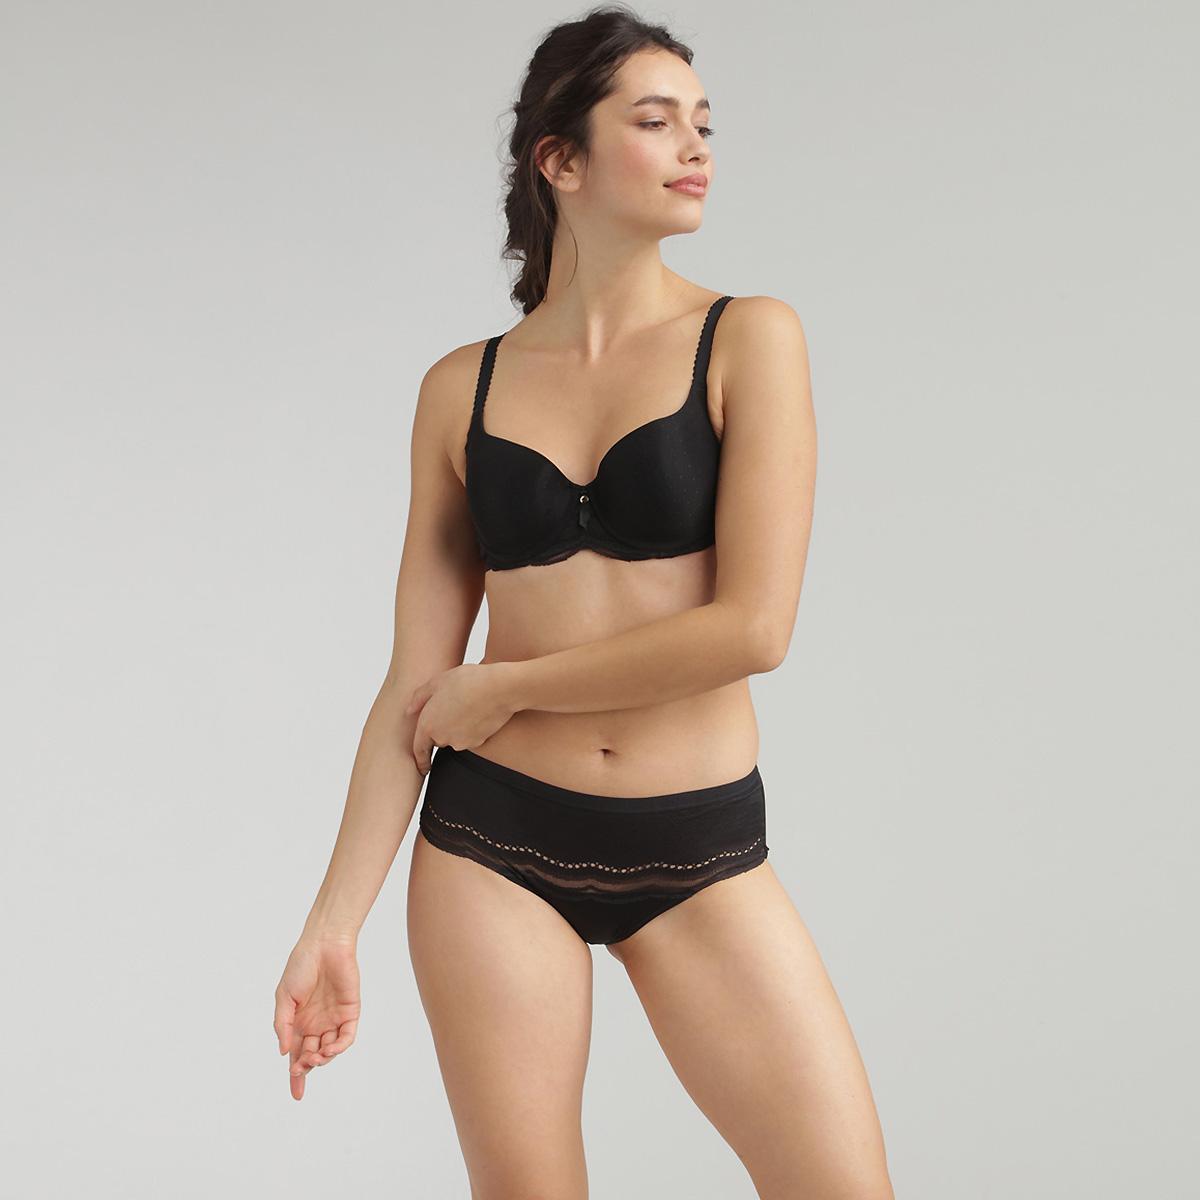 Padded bra in black - Secret Comfort, , PLAYTEX